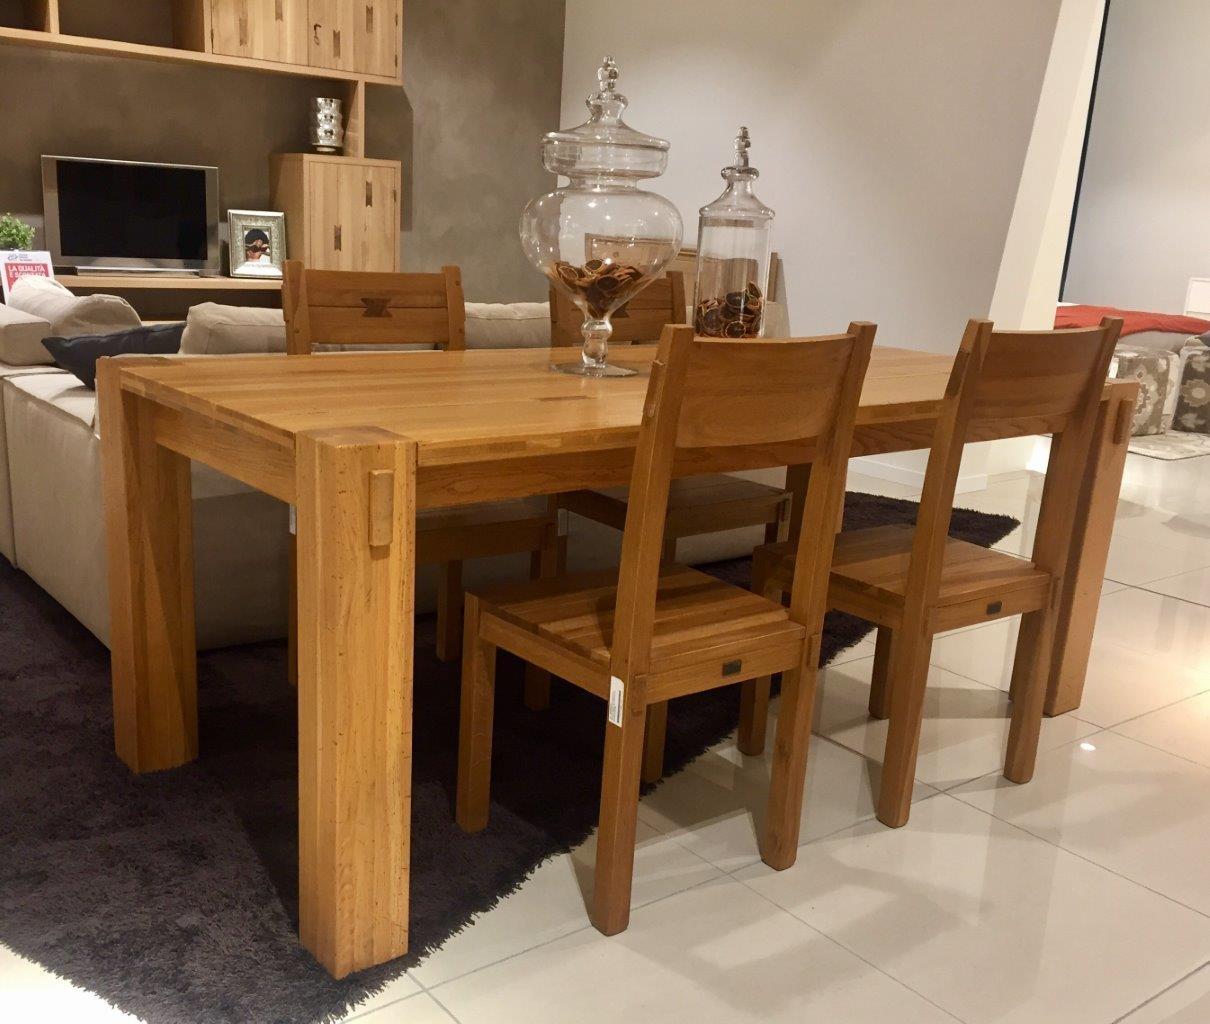 Tavolo e sedie elephant tavoli a prezzi scontati for Tavoli e sedie prezzi